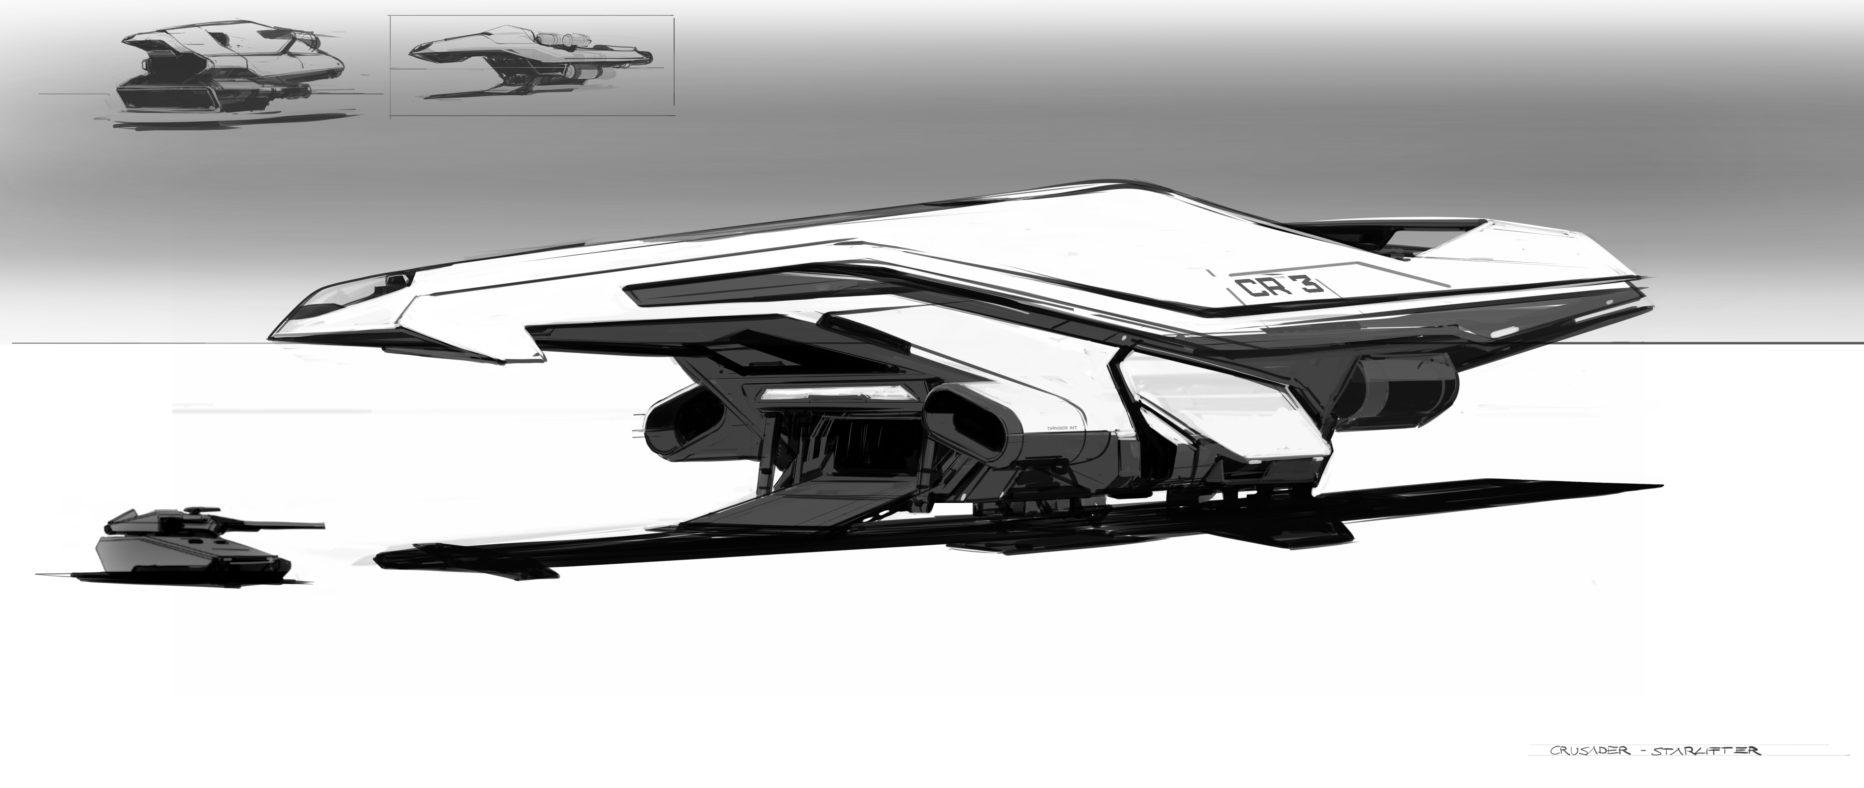 SC-Hercules-Concept-Art-12.jpg